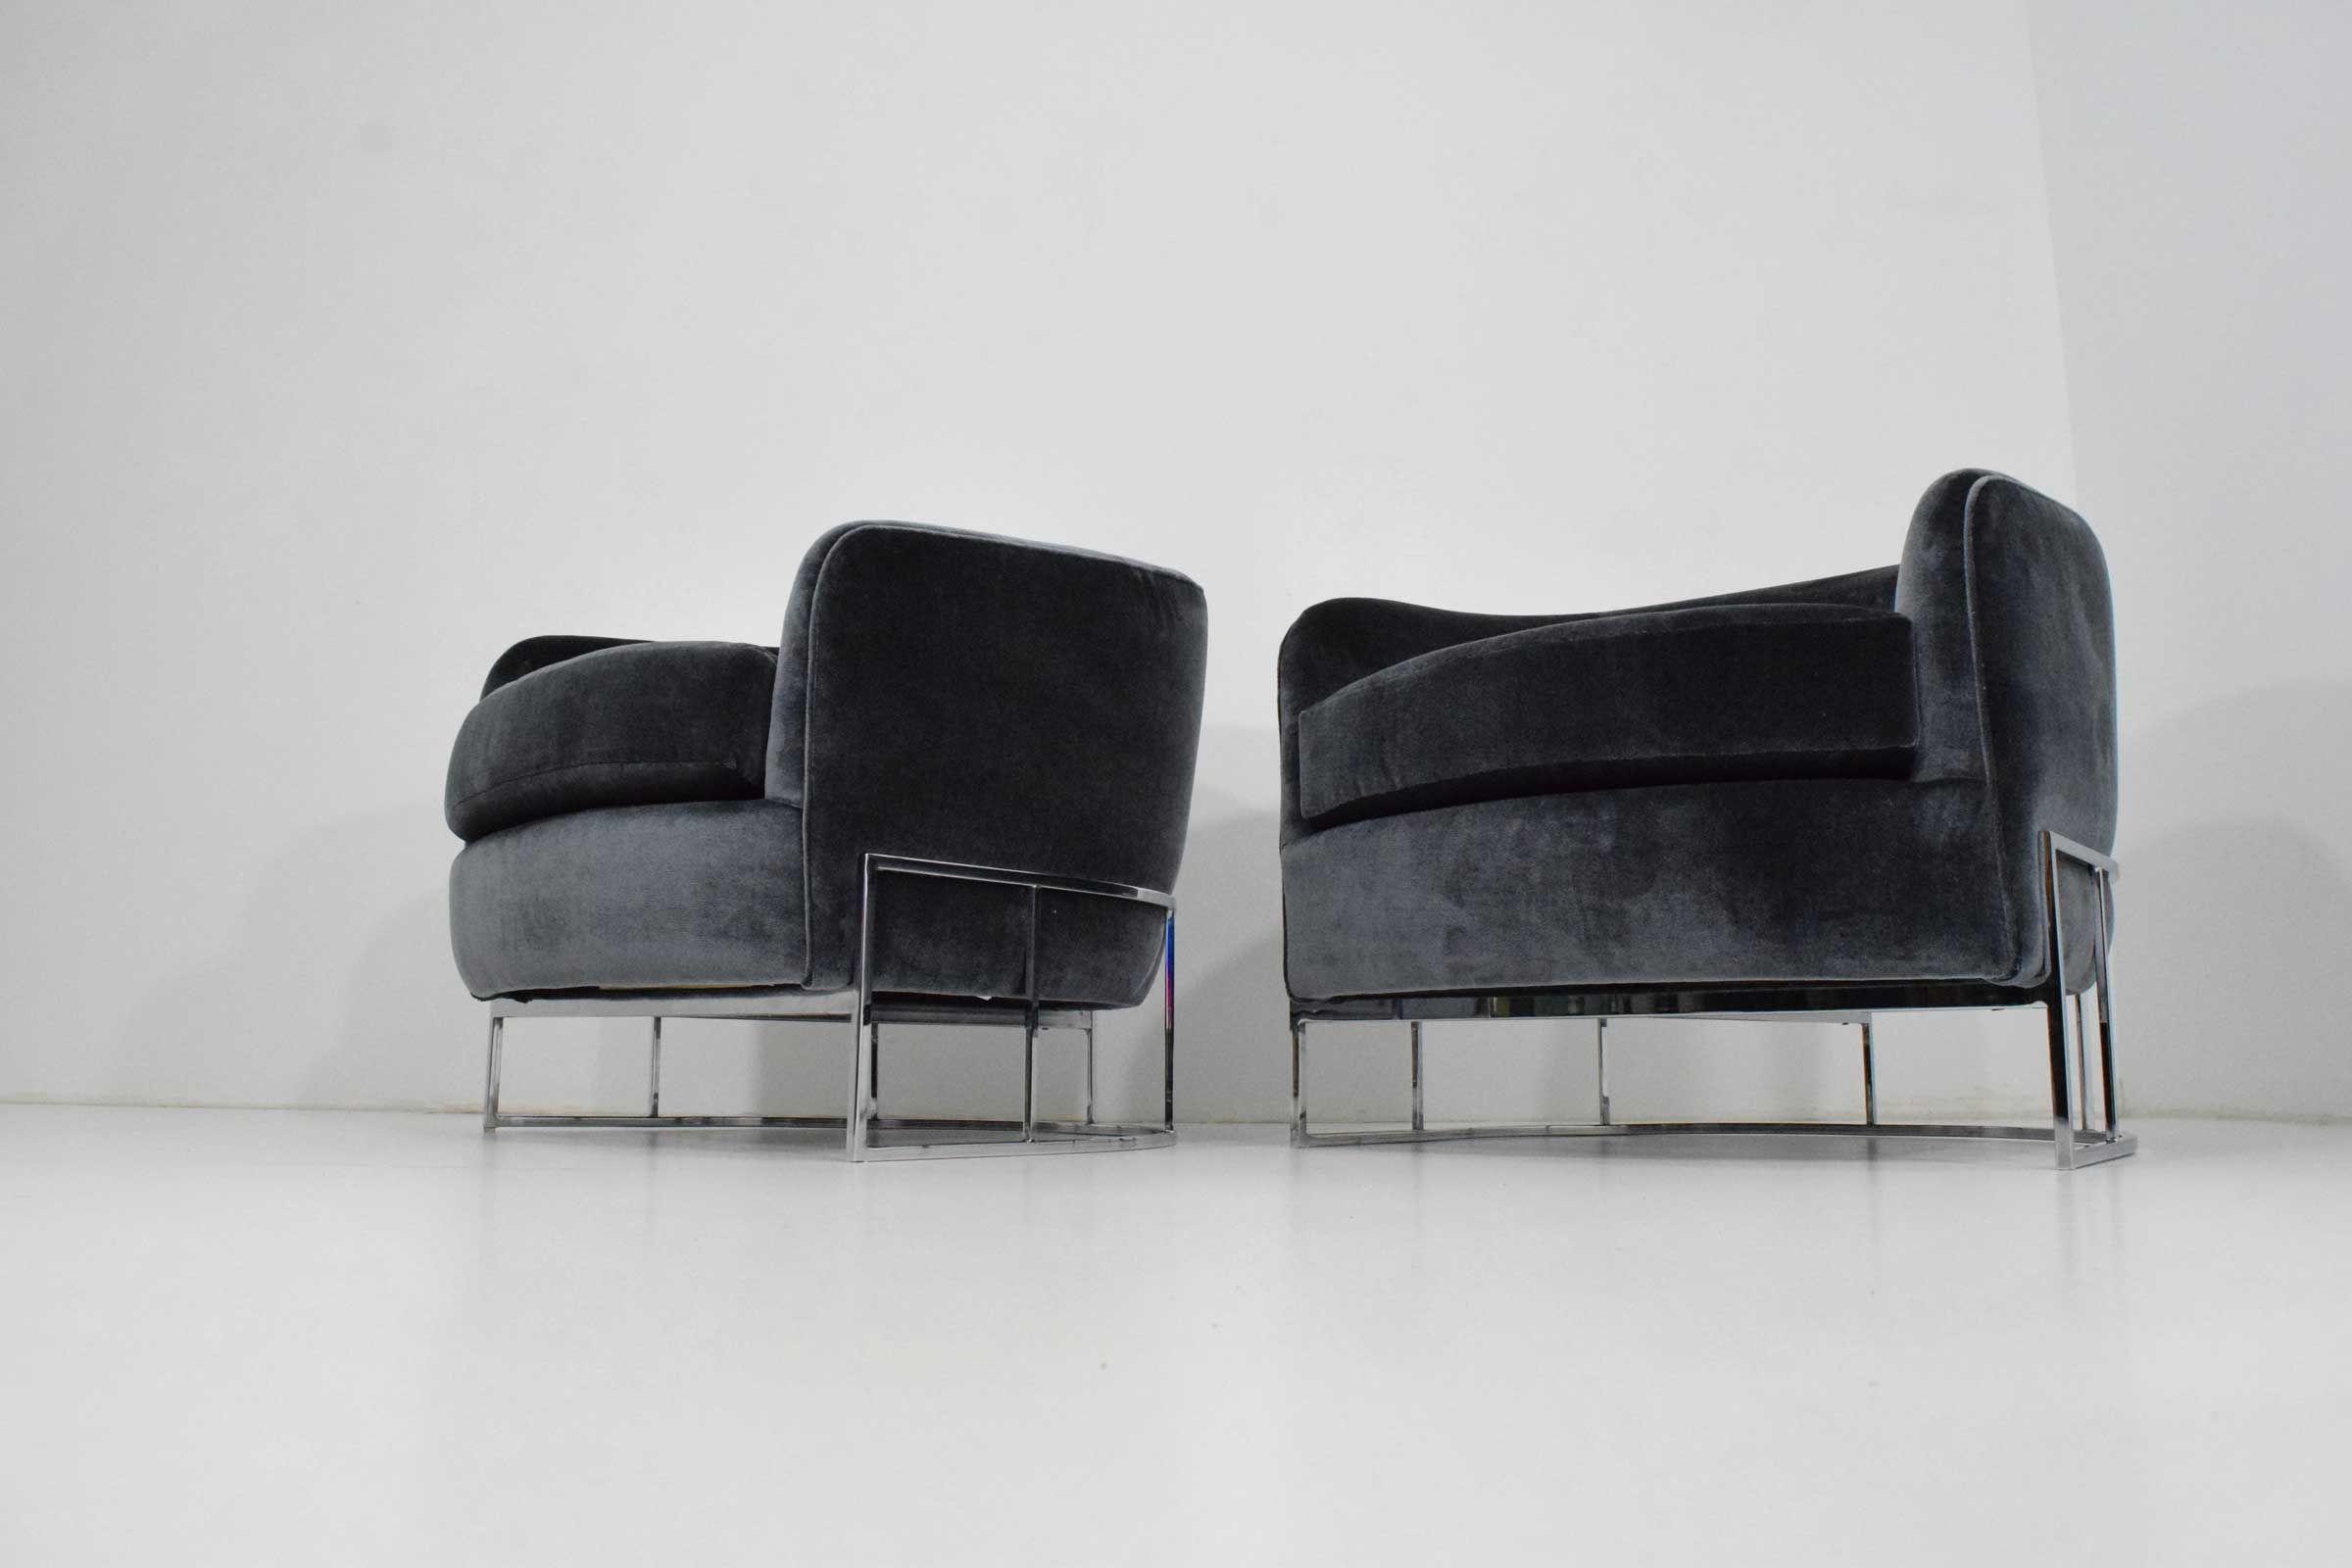 Milo baughman lounge chairs in velvet